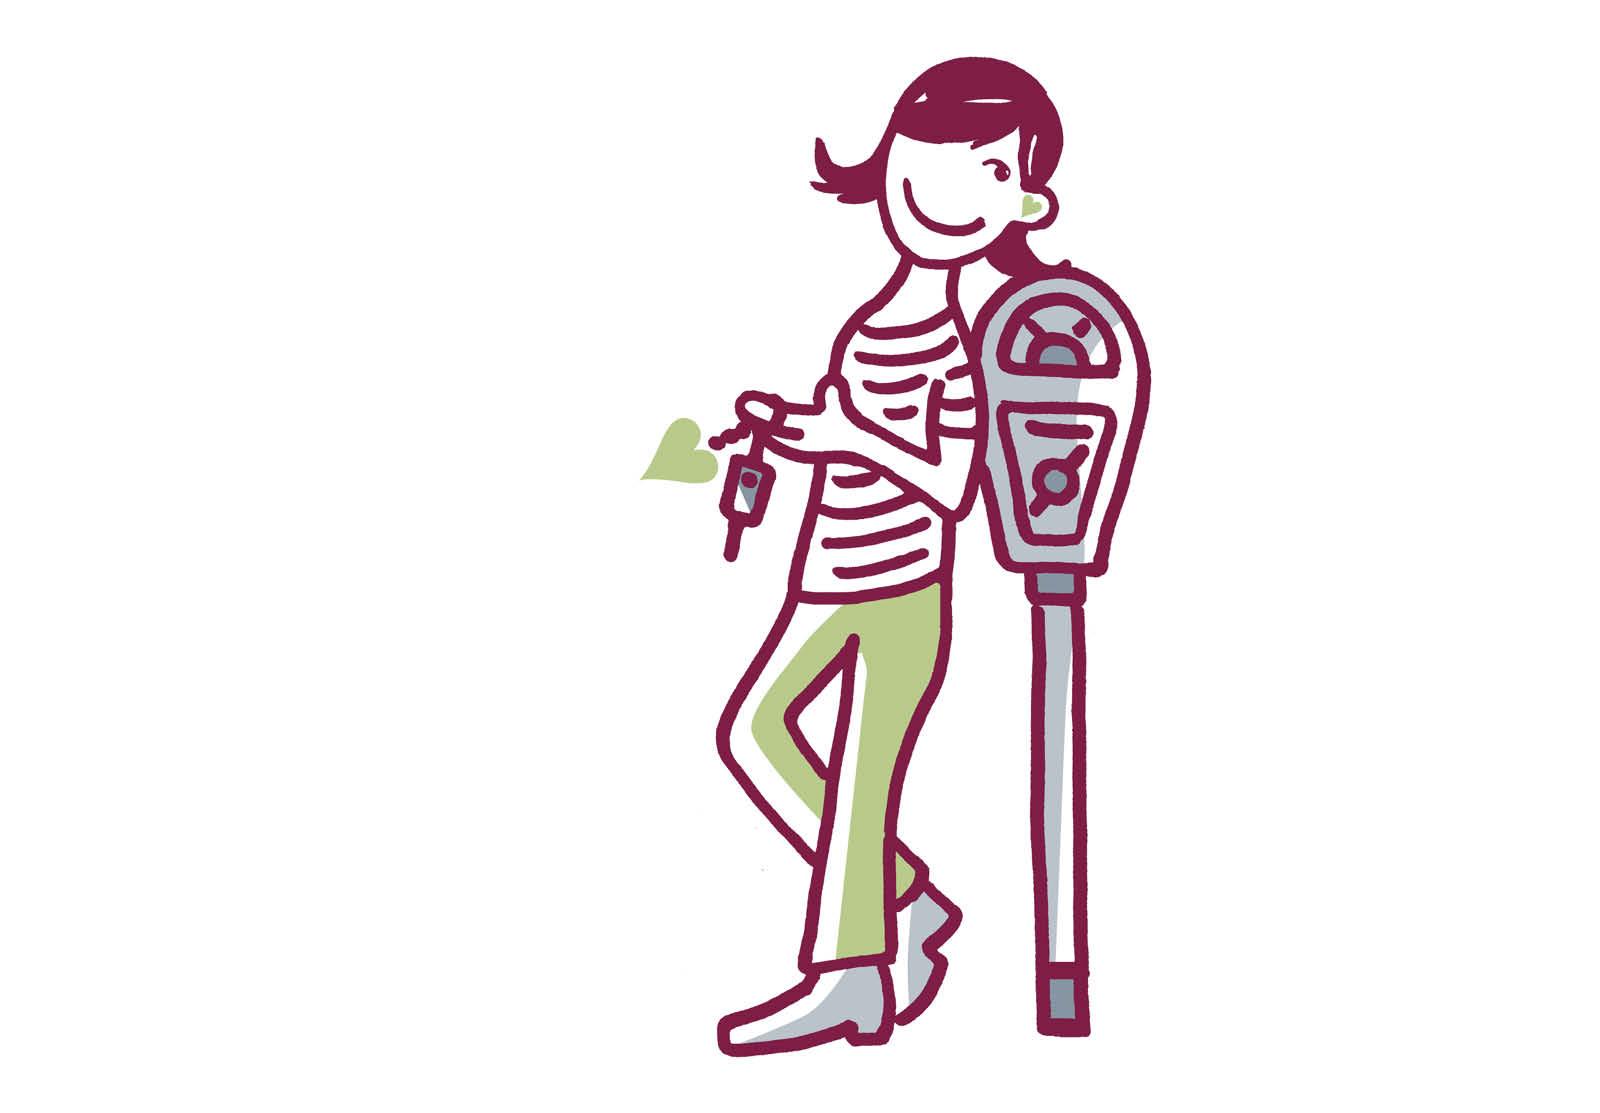 sympathiefigur-illustration-hoerakustik-winkelmann-02.jpg